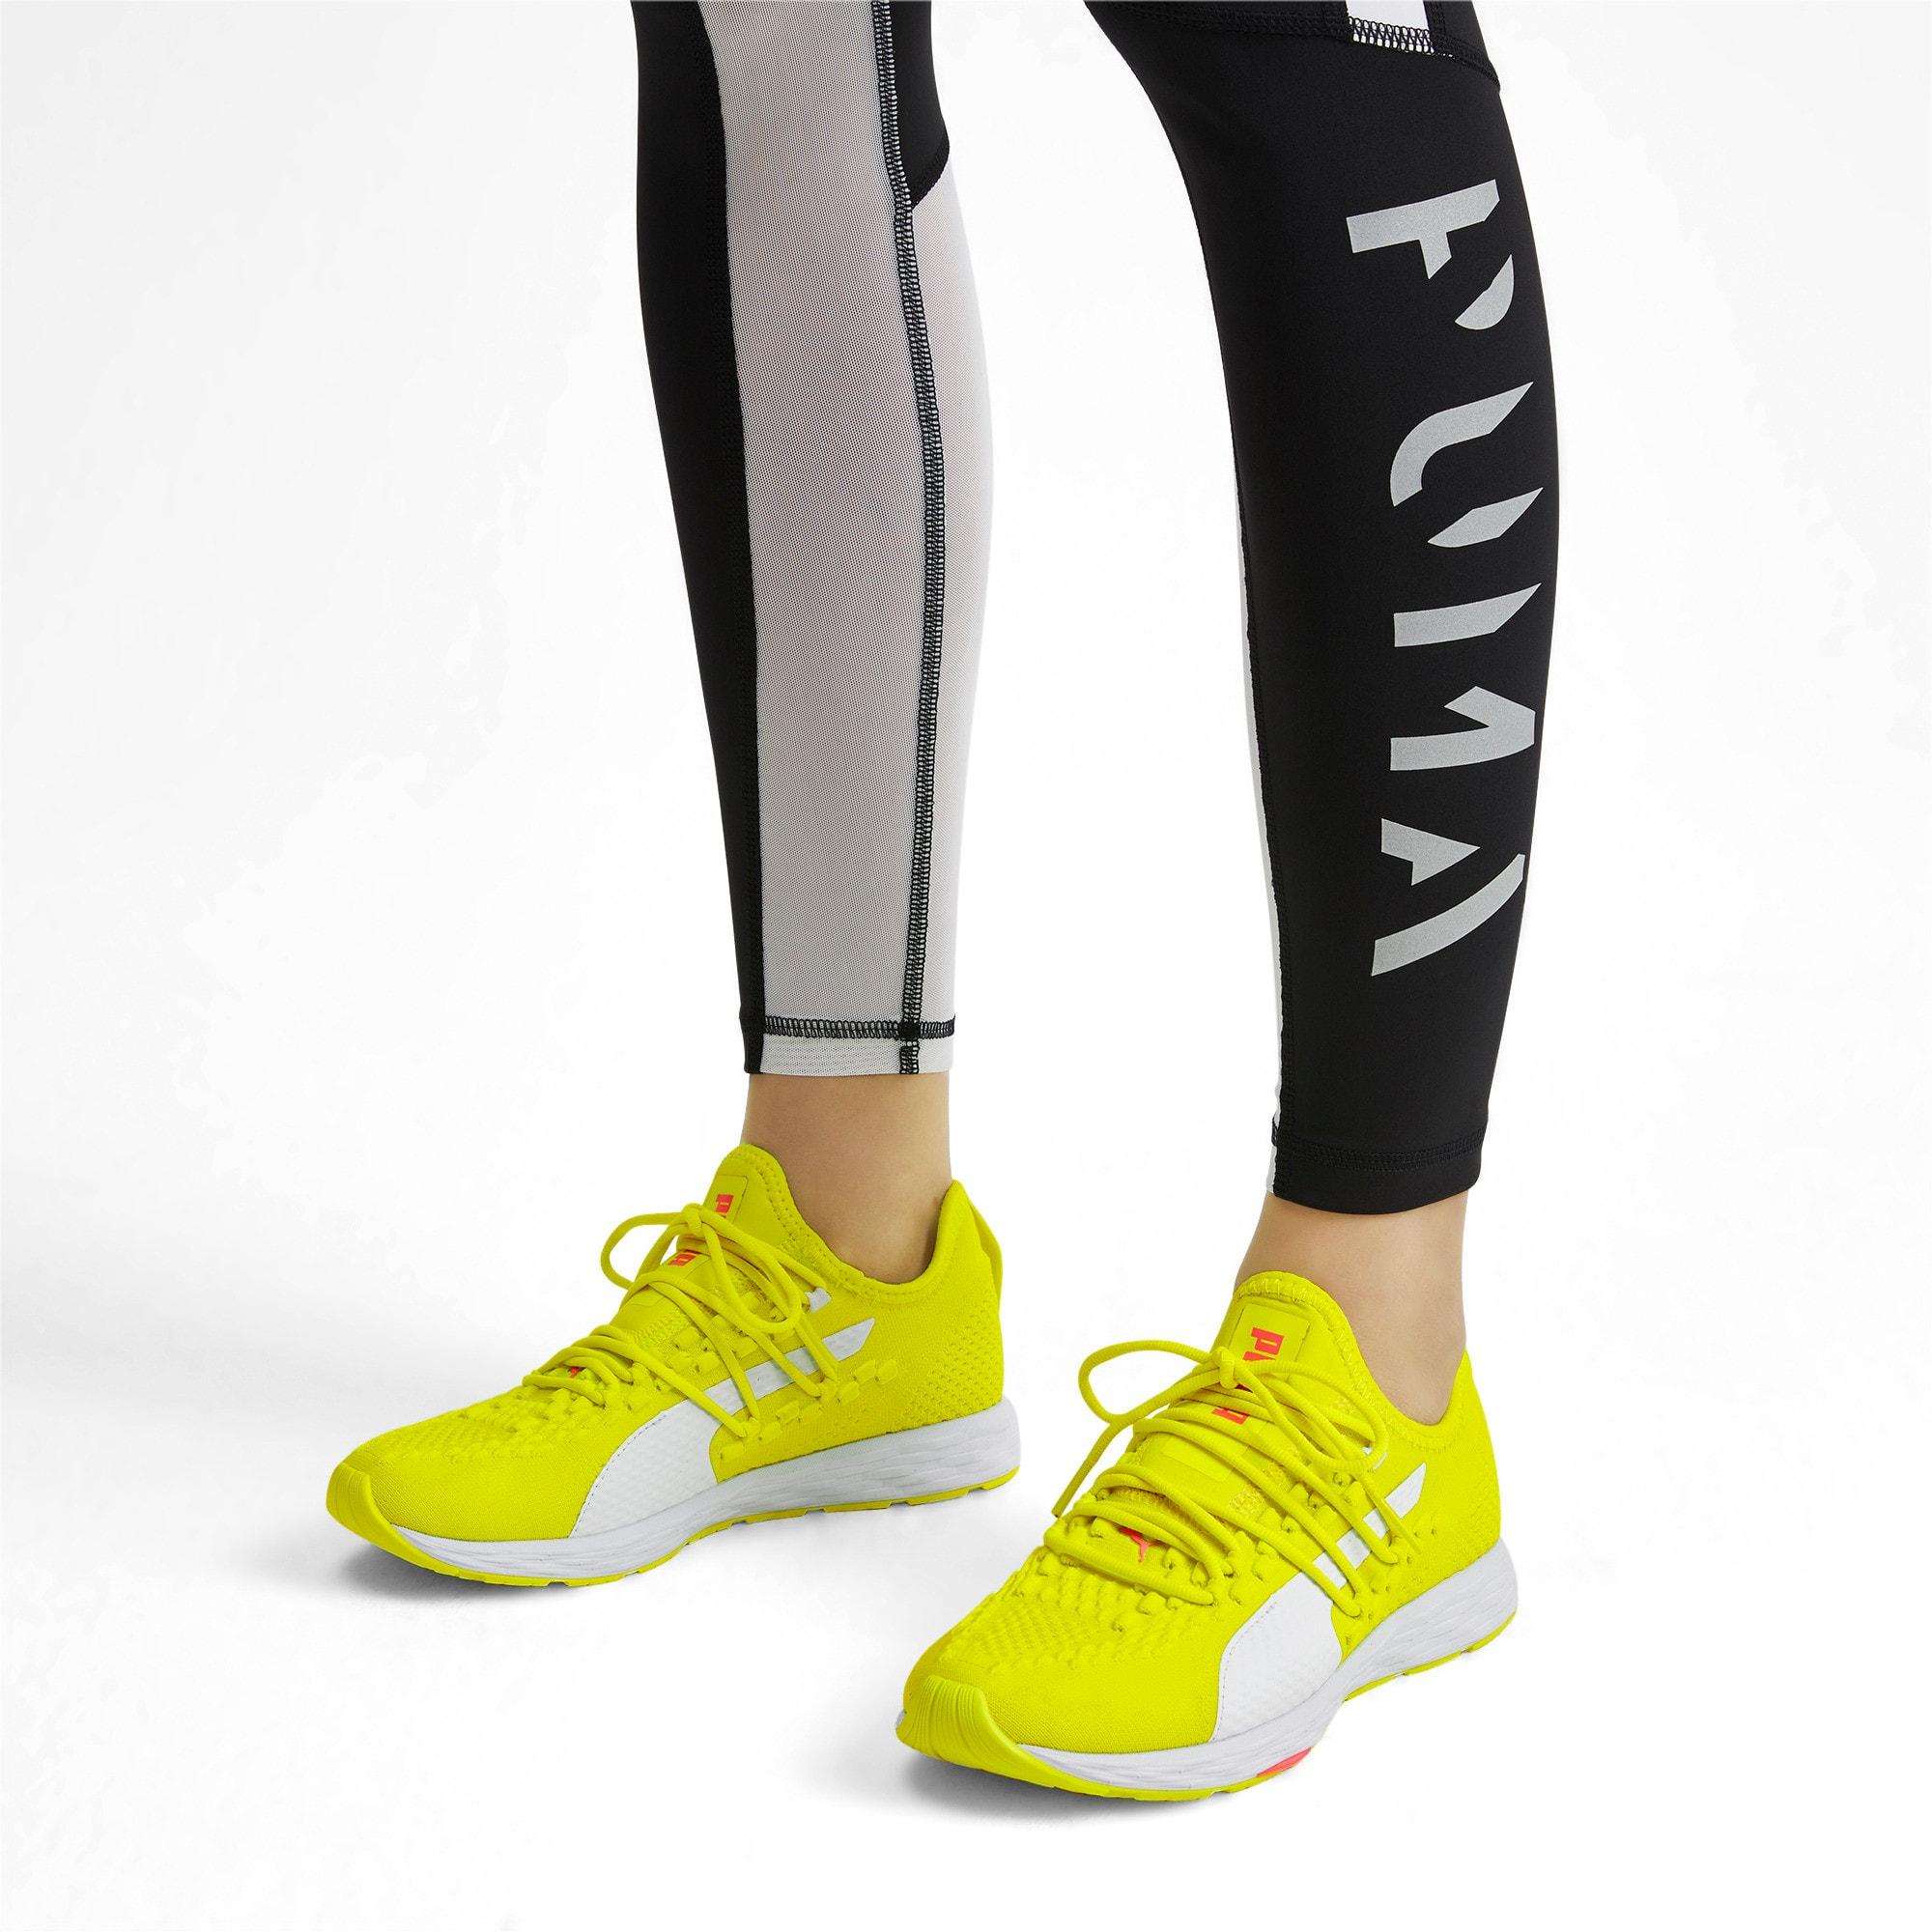 Thumbnail 2 of SPEED RACER Women's Running Shoes, Yellow-White-Pink Alert, medium-IND